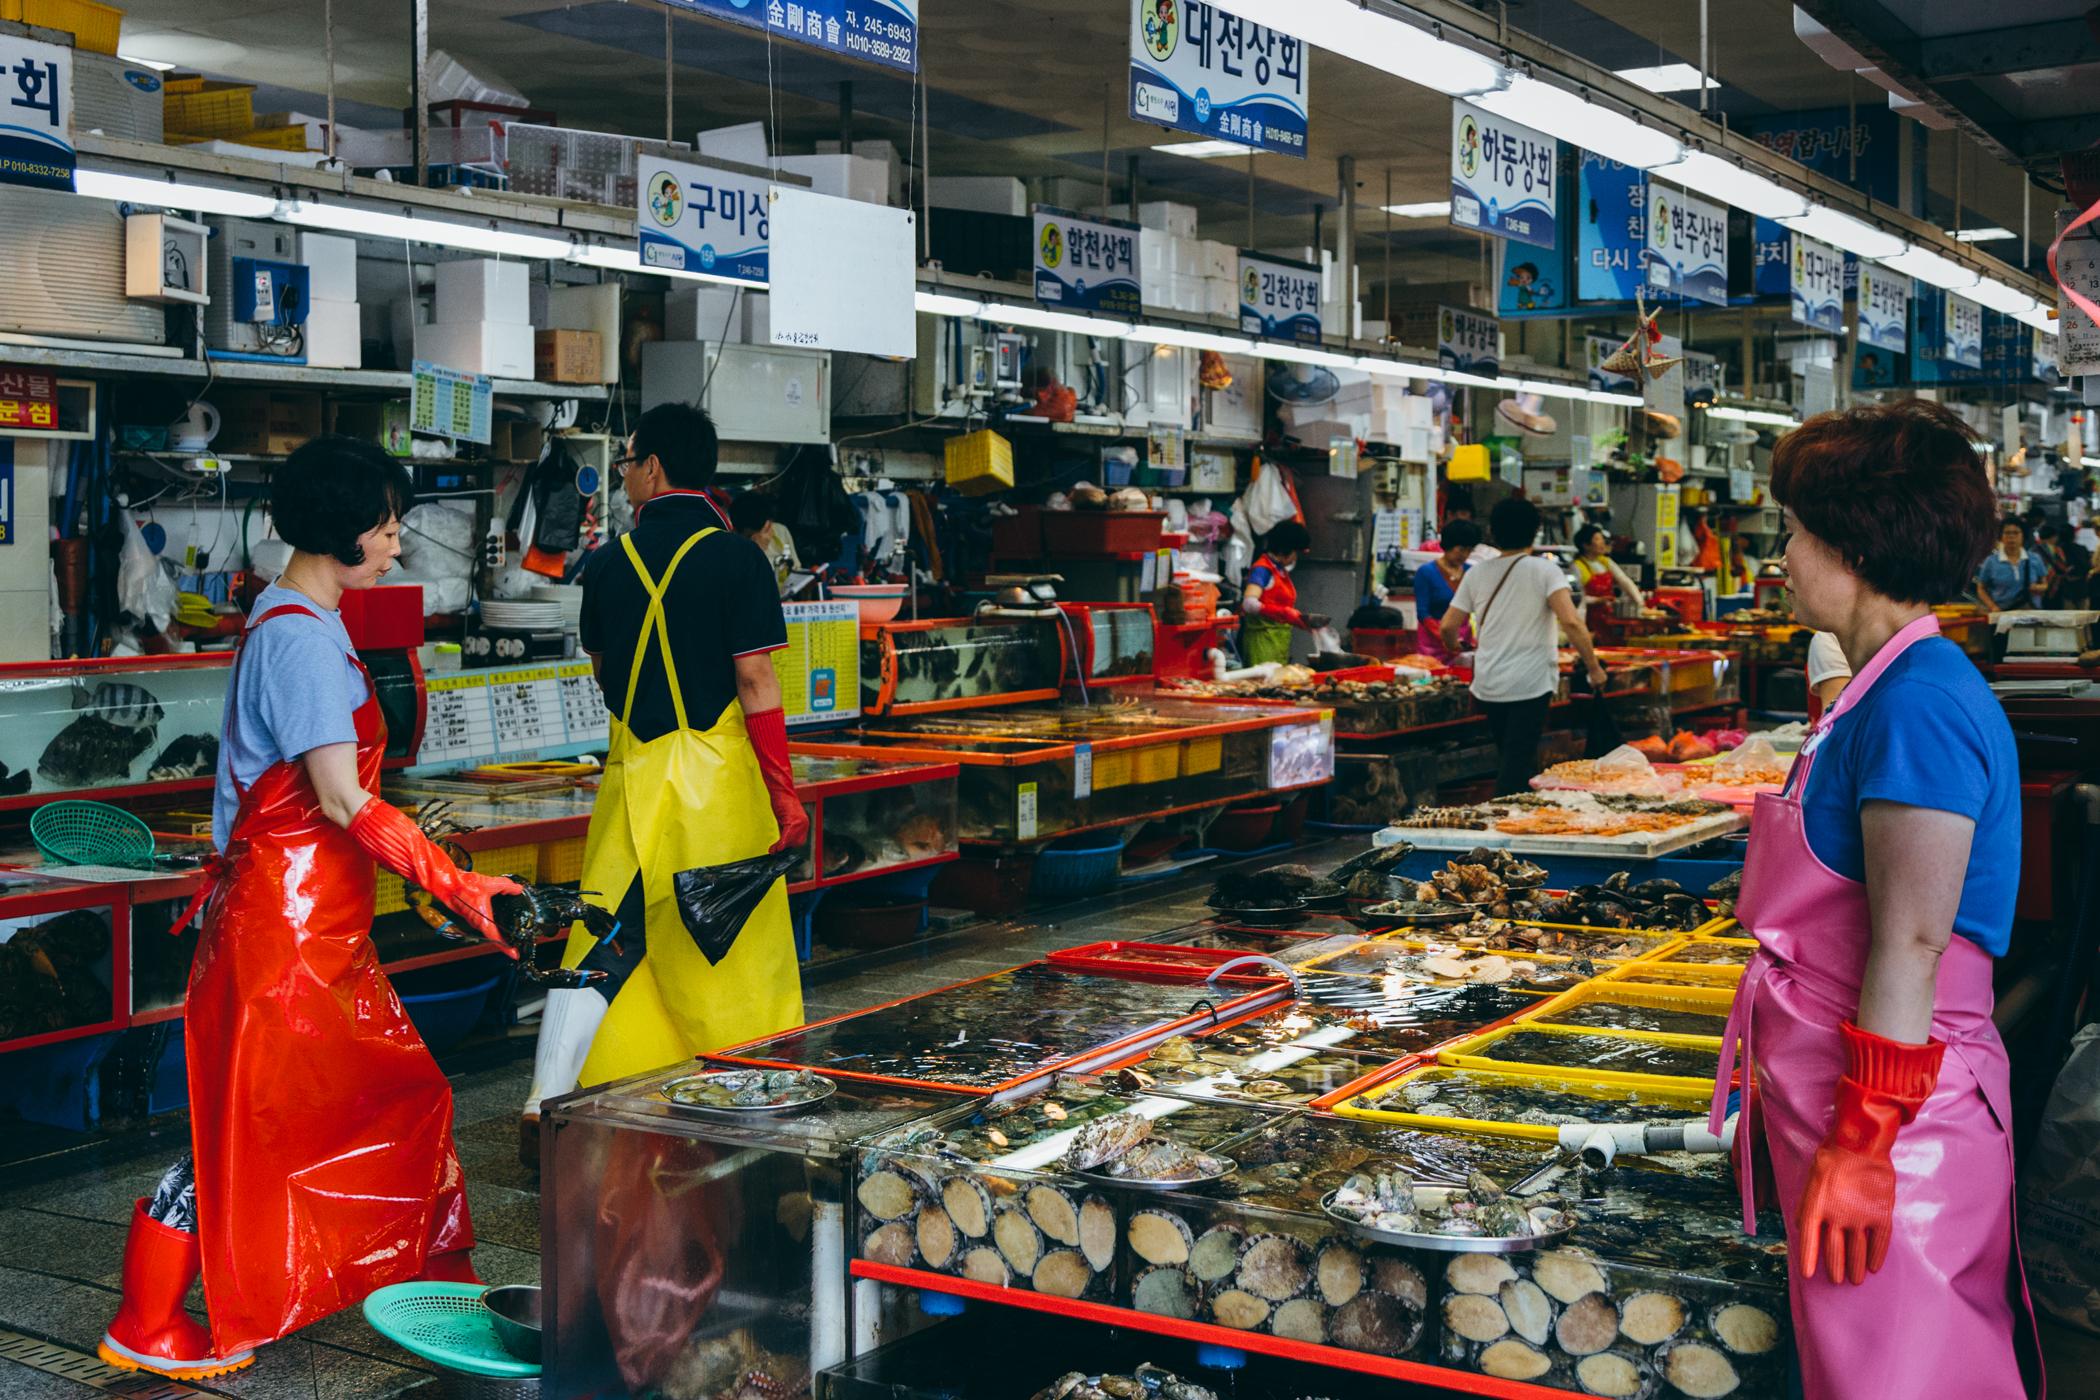 Greysuitcase Busan Series: Jagalchi Market (자갈치시장), Busan (부산), South Korea.